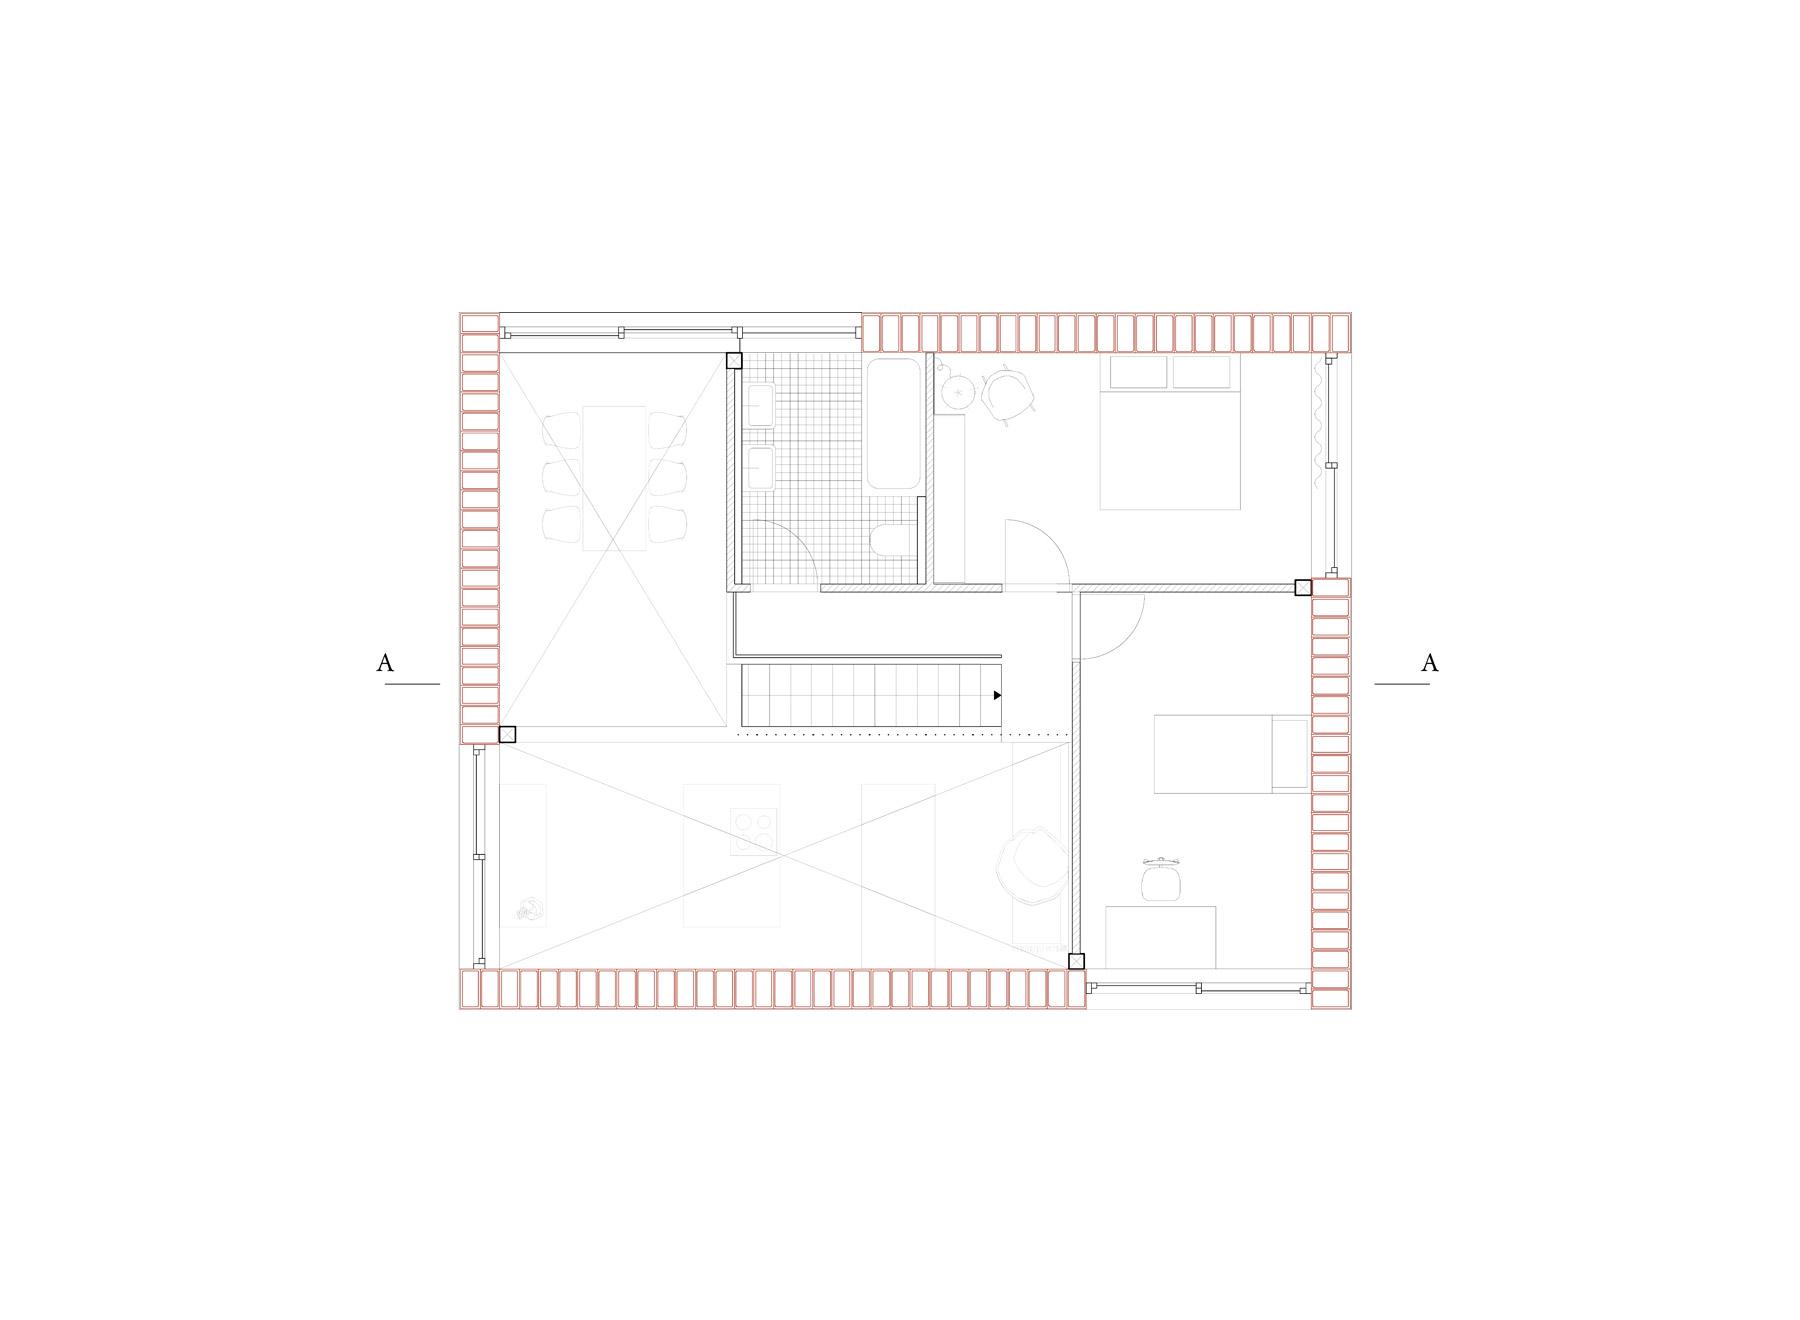 6/8 house, upper floor